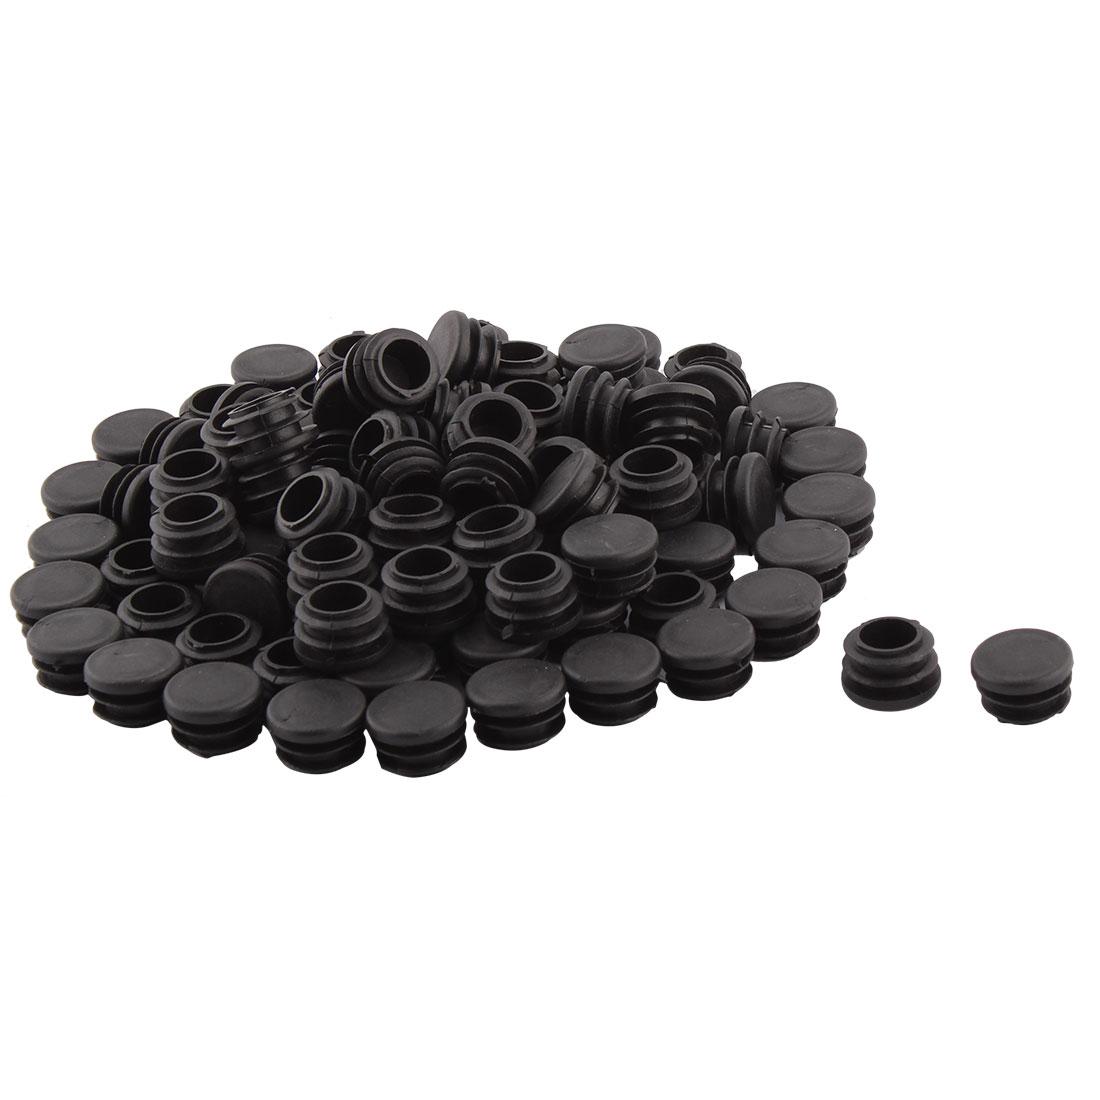 Hardware For Household Plastic Round Shaped Table Chair Leg Feet Tube Pipe Insert Black 22mm Dia 100 Pcs